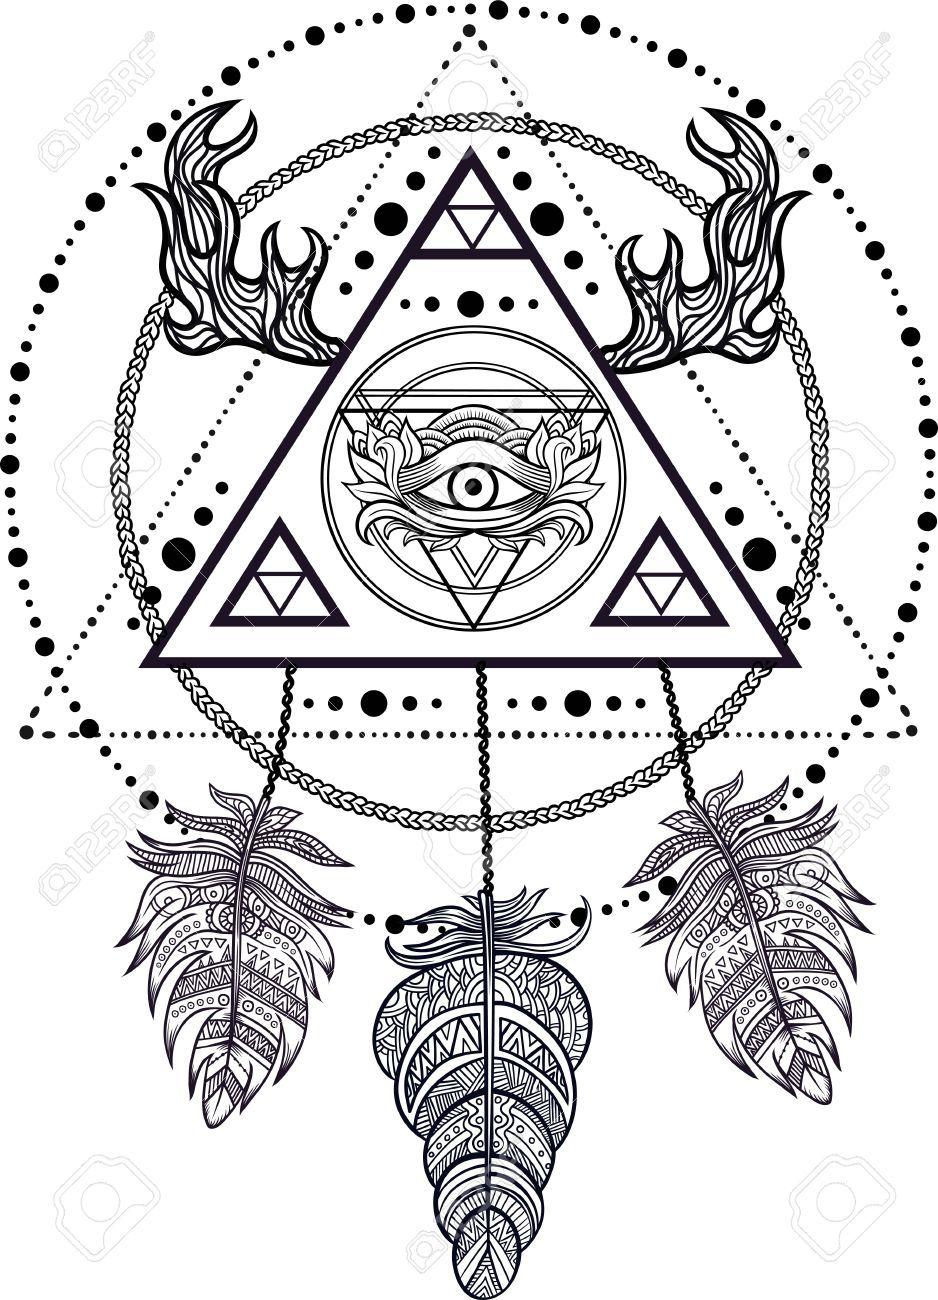 78803b583 Blackwork tattoo flash. Dreamcatcher with third eye, feathers and deer  antlers. Tattoo design, mystic symbol. New school dotwork. Boho hipster  design.